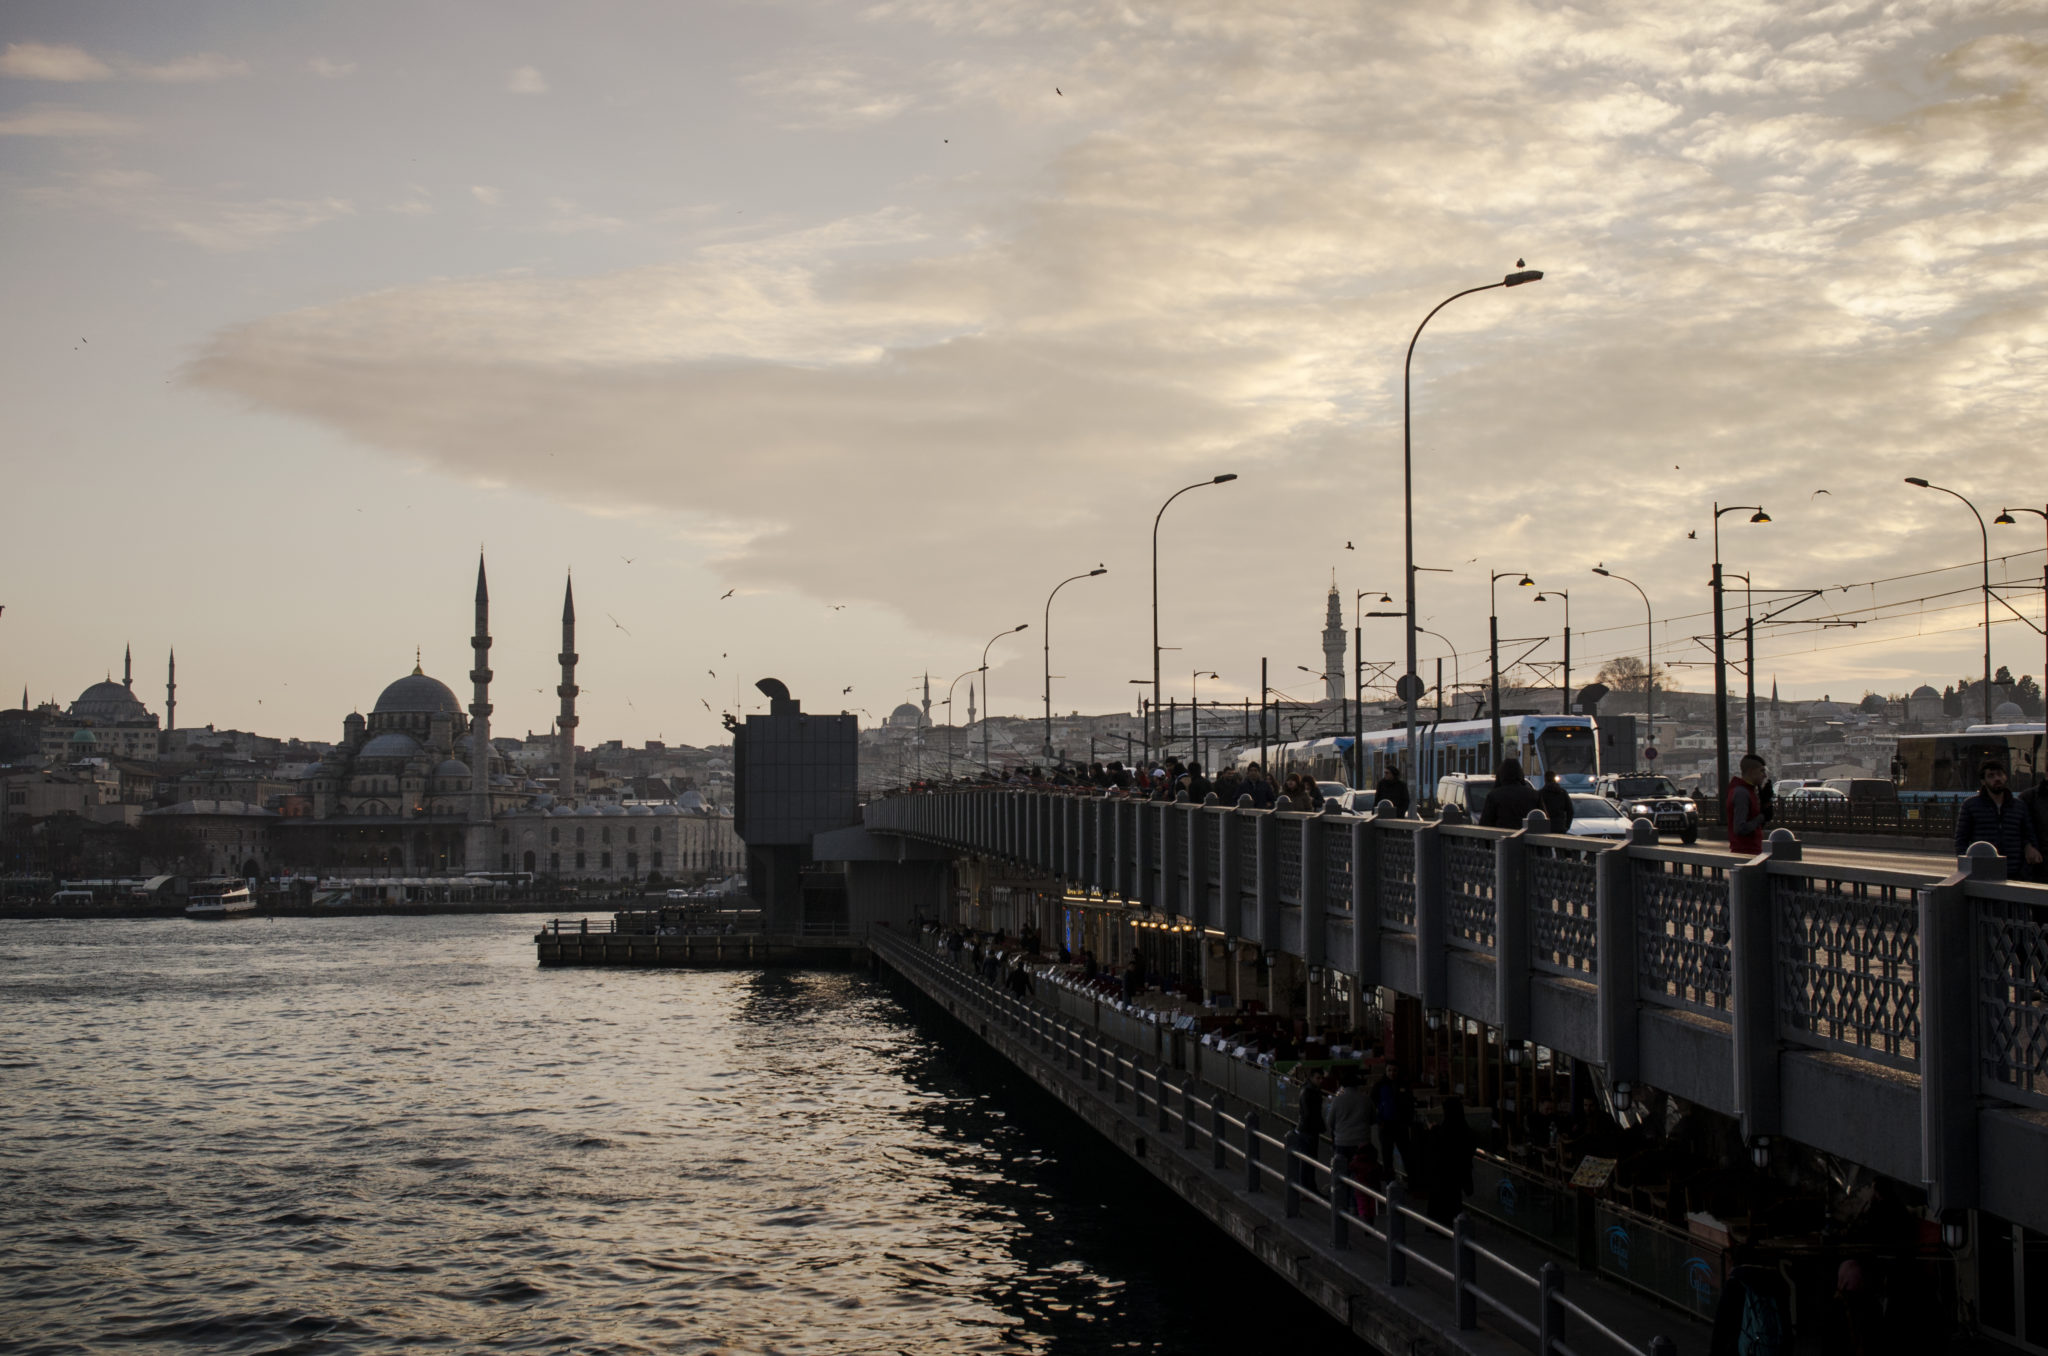 Tuerkei-Sehenswuerdigkeiten-Galata-Bruecke-Istanbul